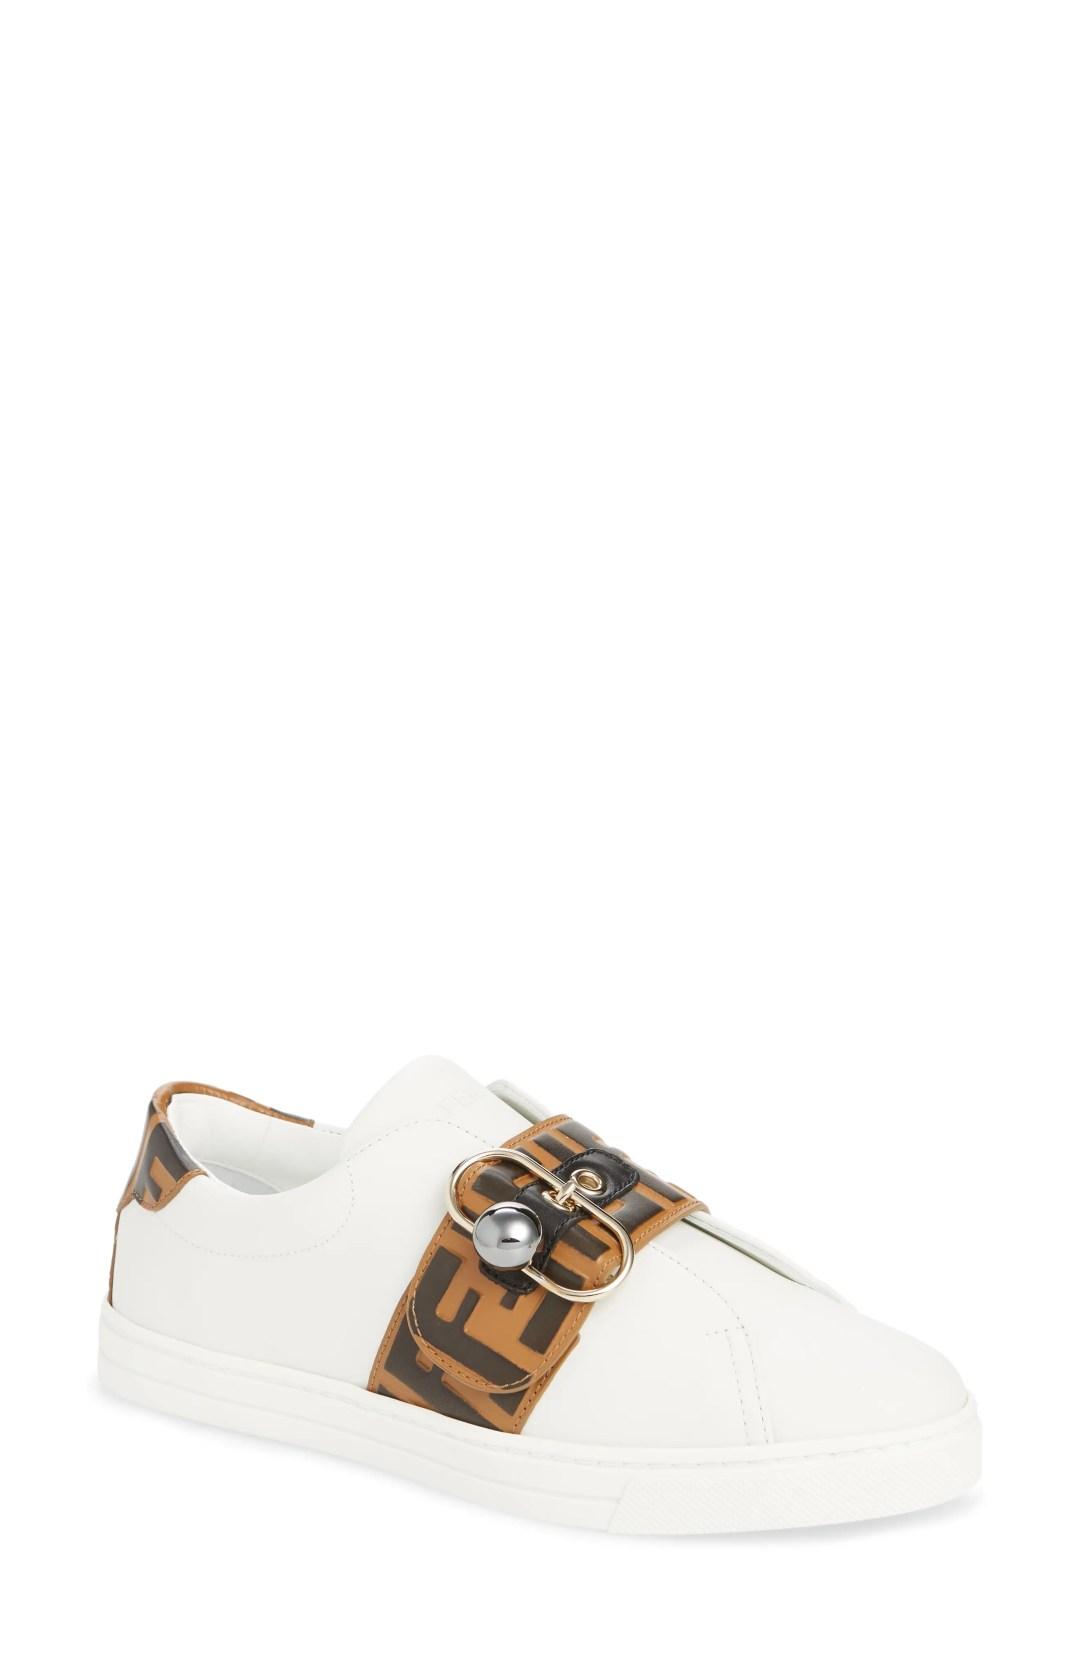 3728ac6b0 Women's Fendi Pearland Logo Slip-On Sneaker, Size 7.5US / 38EU – White –  NORDSTROM.com – $690.00